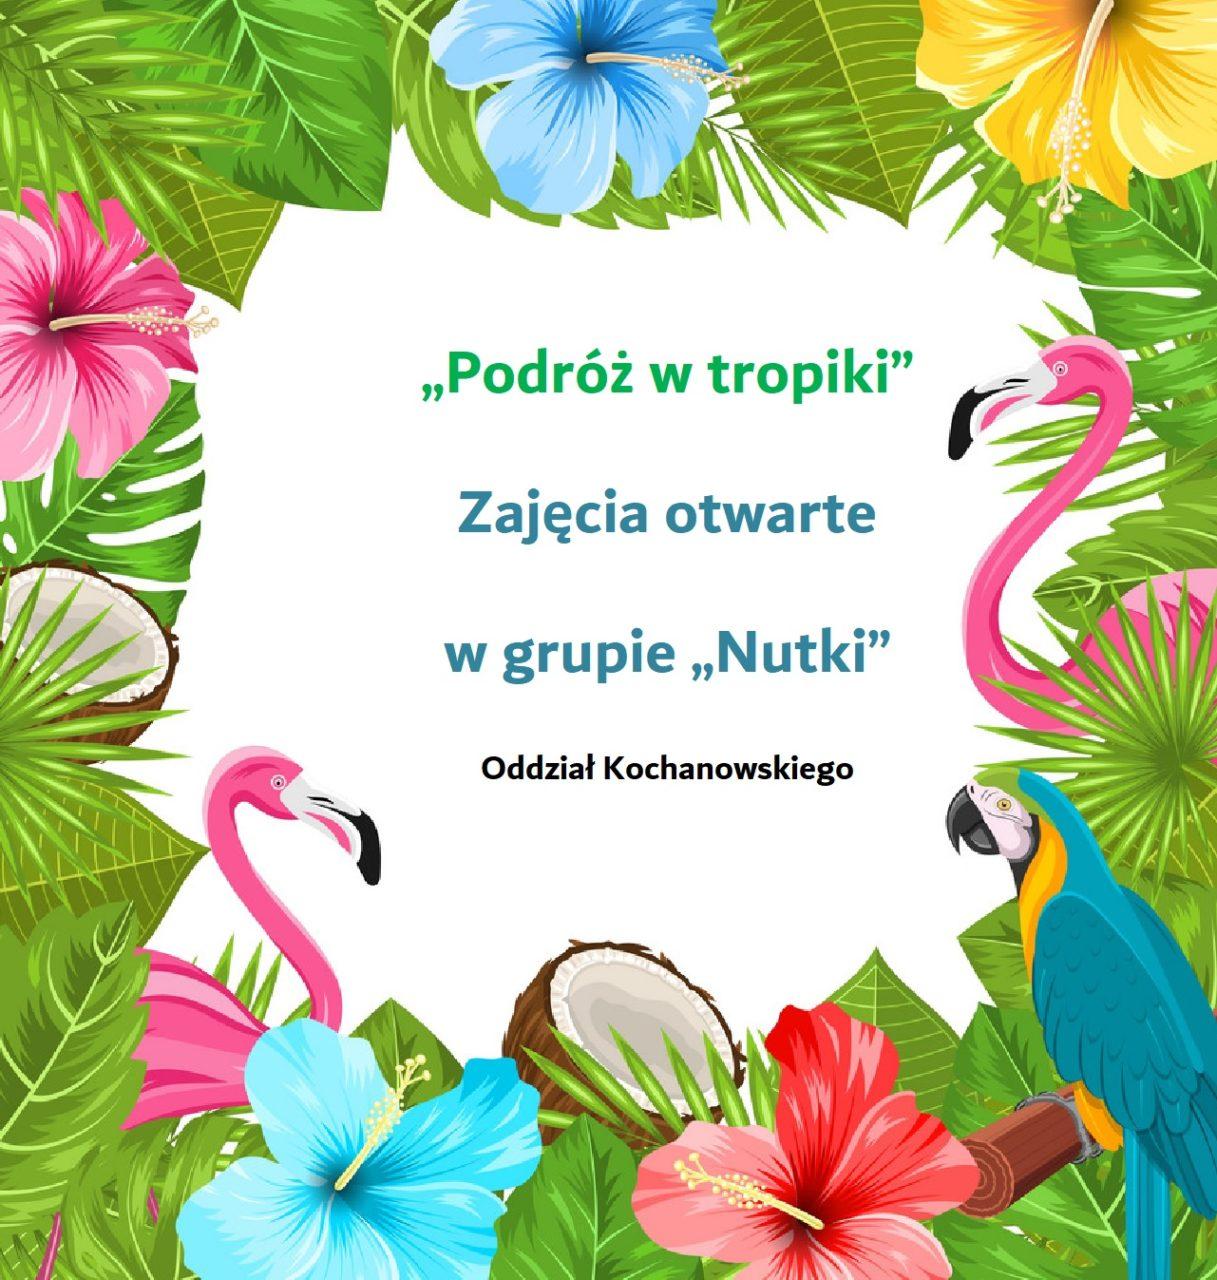 1. tropiki